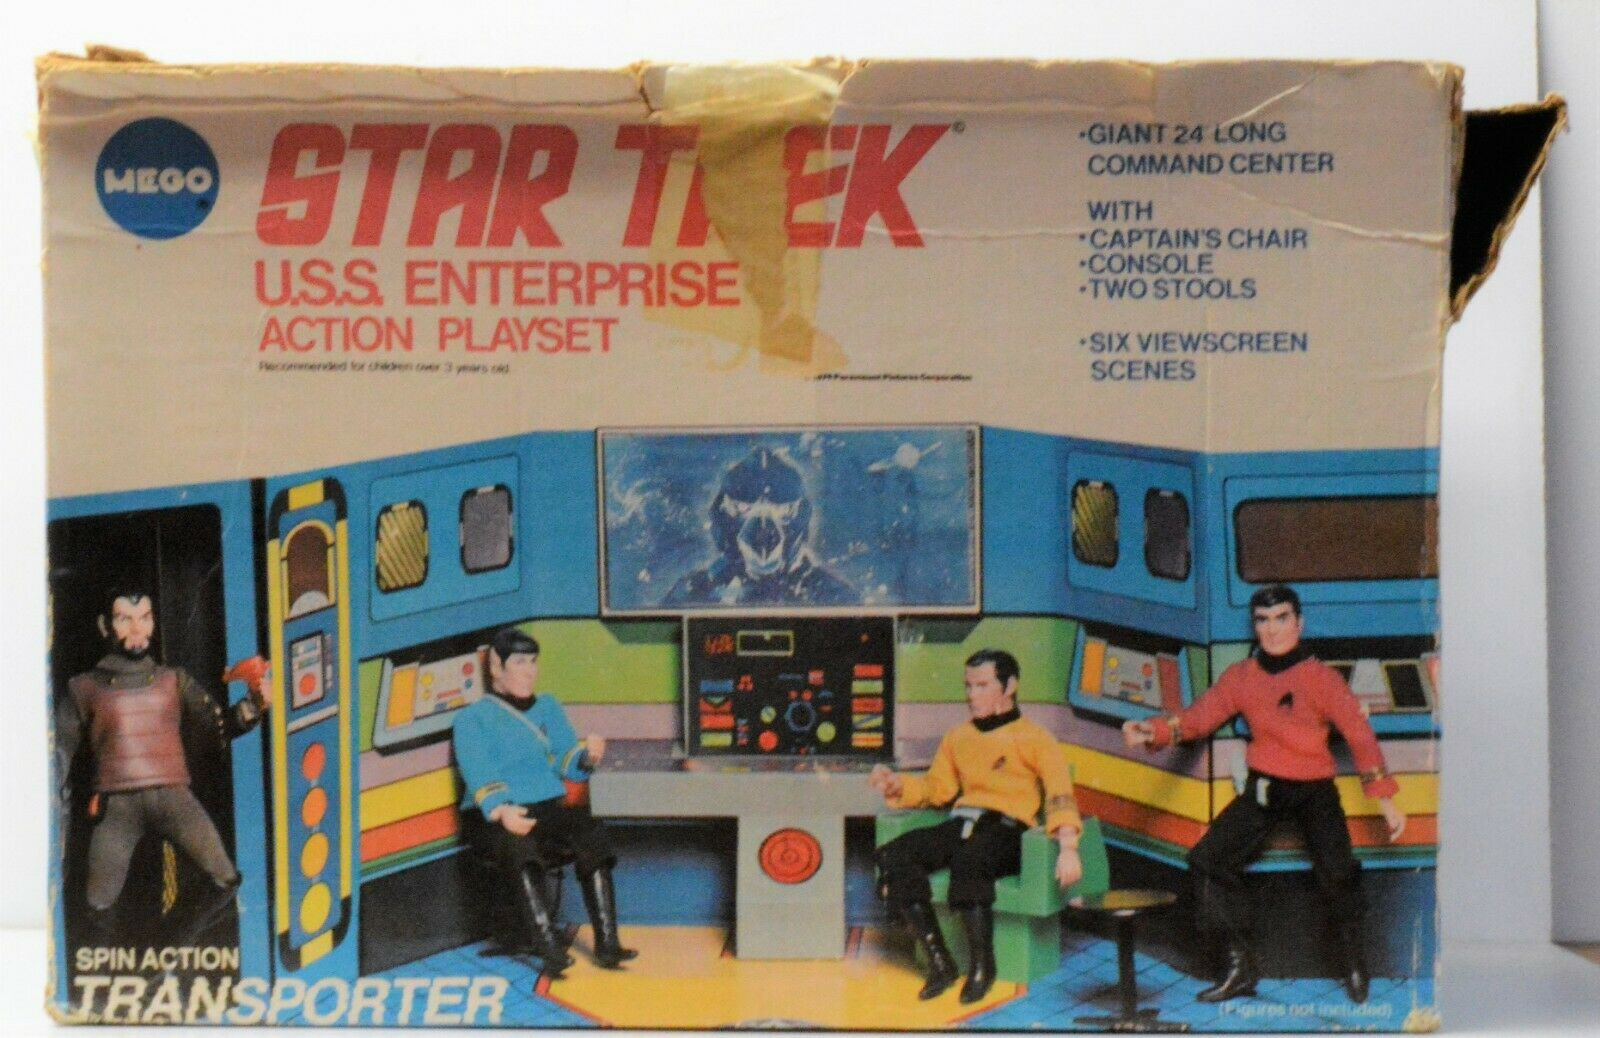 MEGO Star Trek U.S.S. Enterprise playset vintage in box 1974